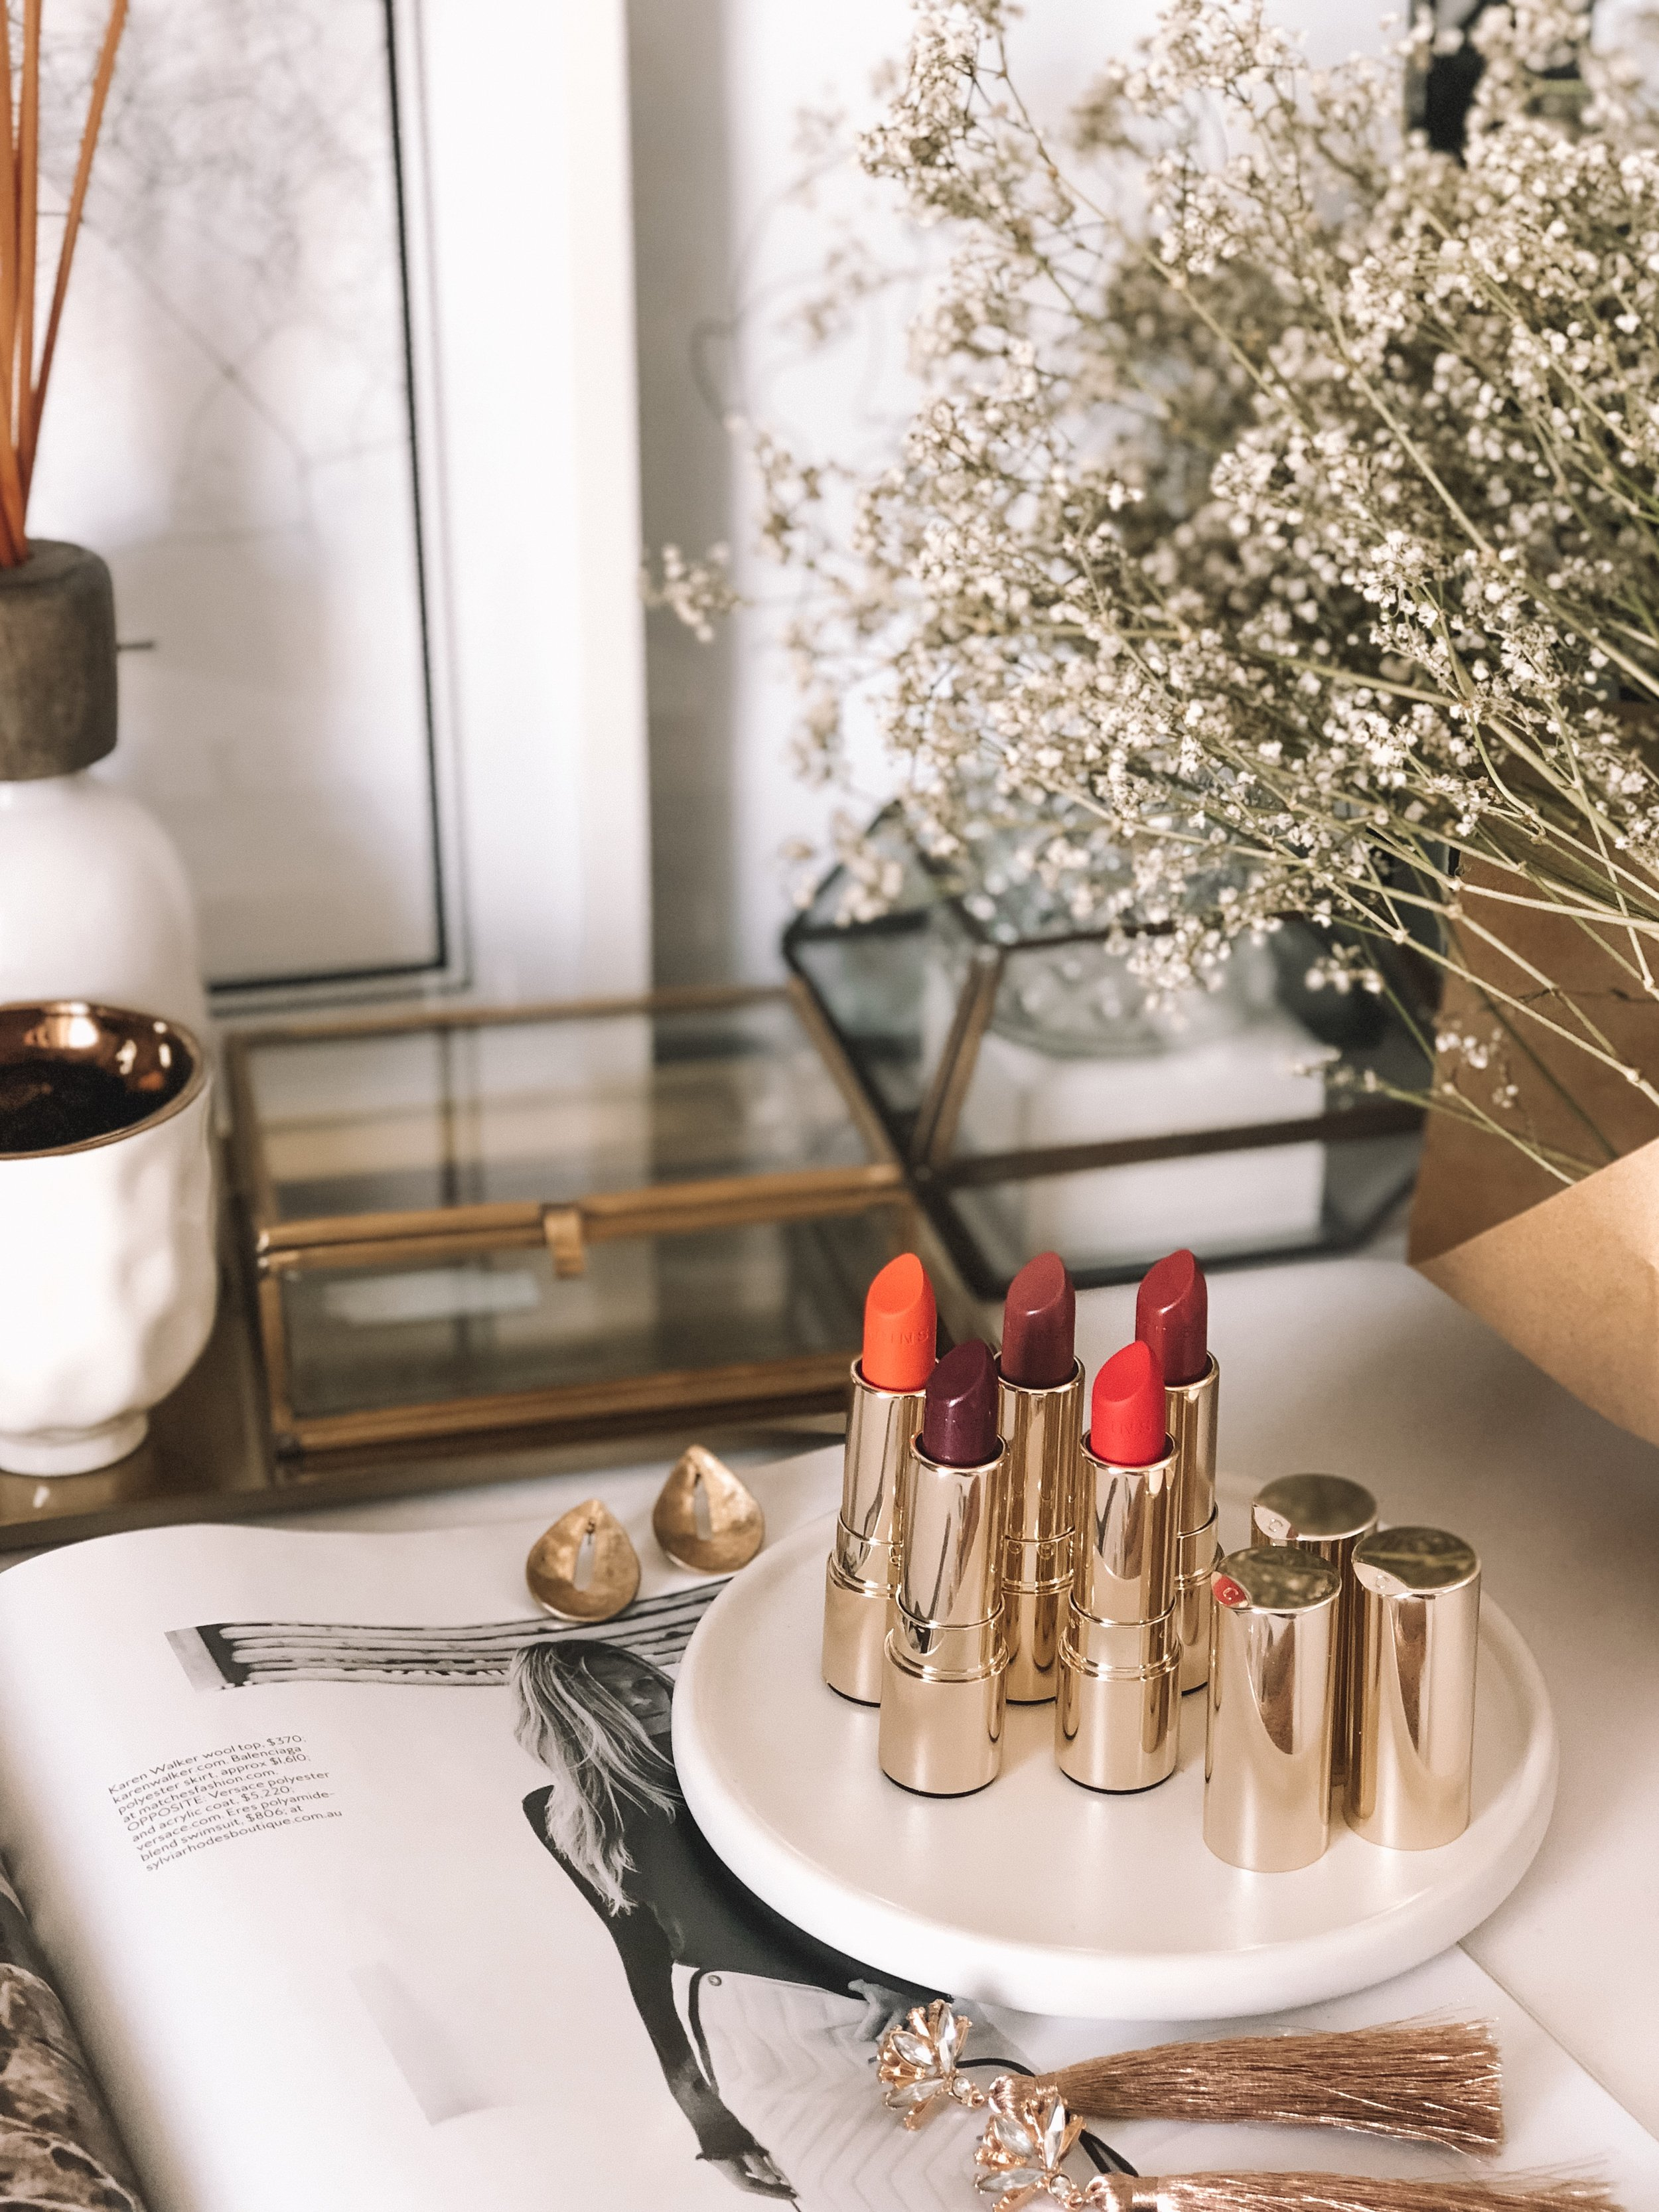 Clarins Joli Rouge Lipstick Shades